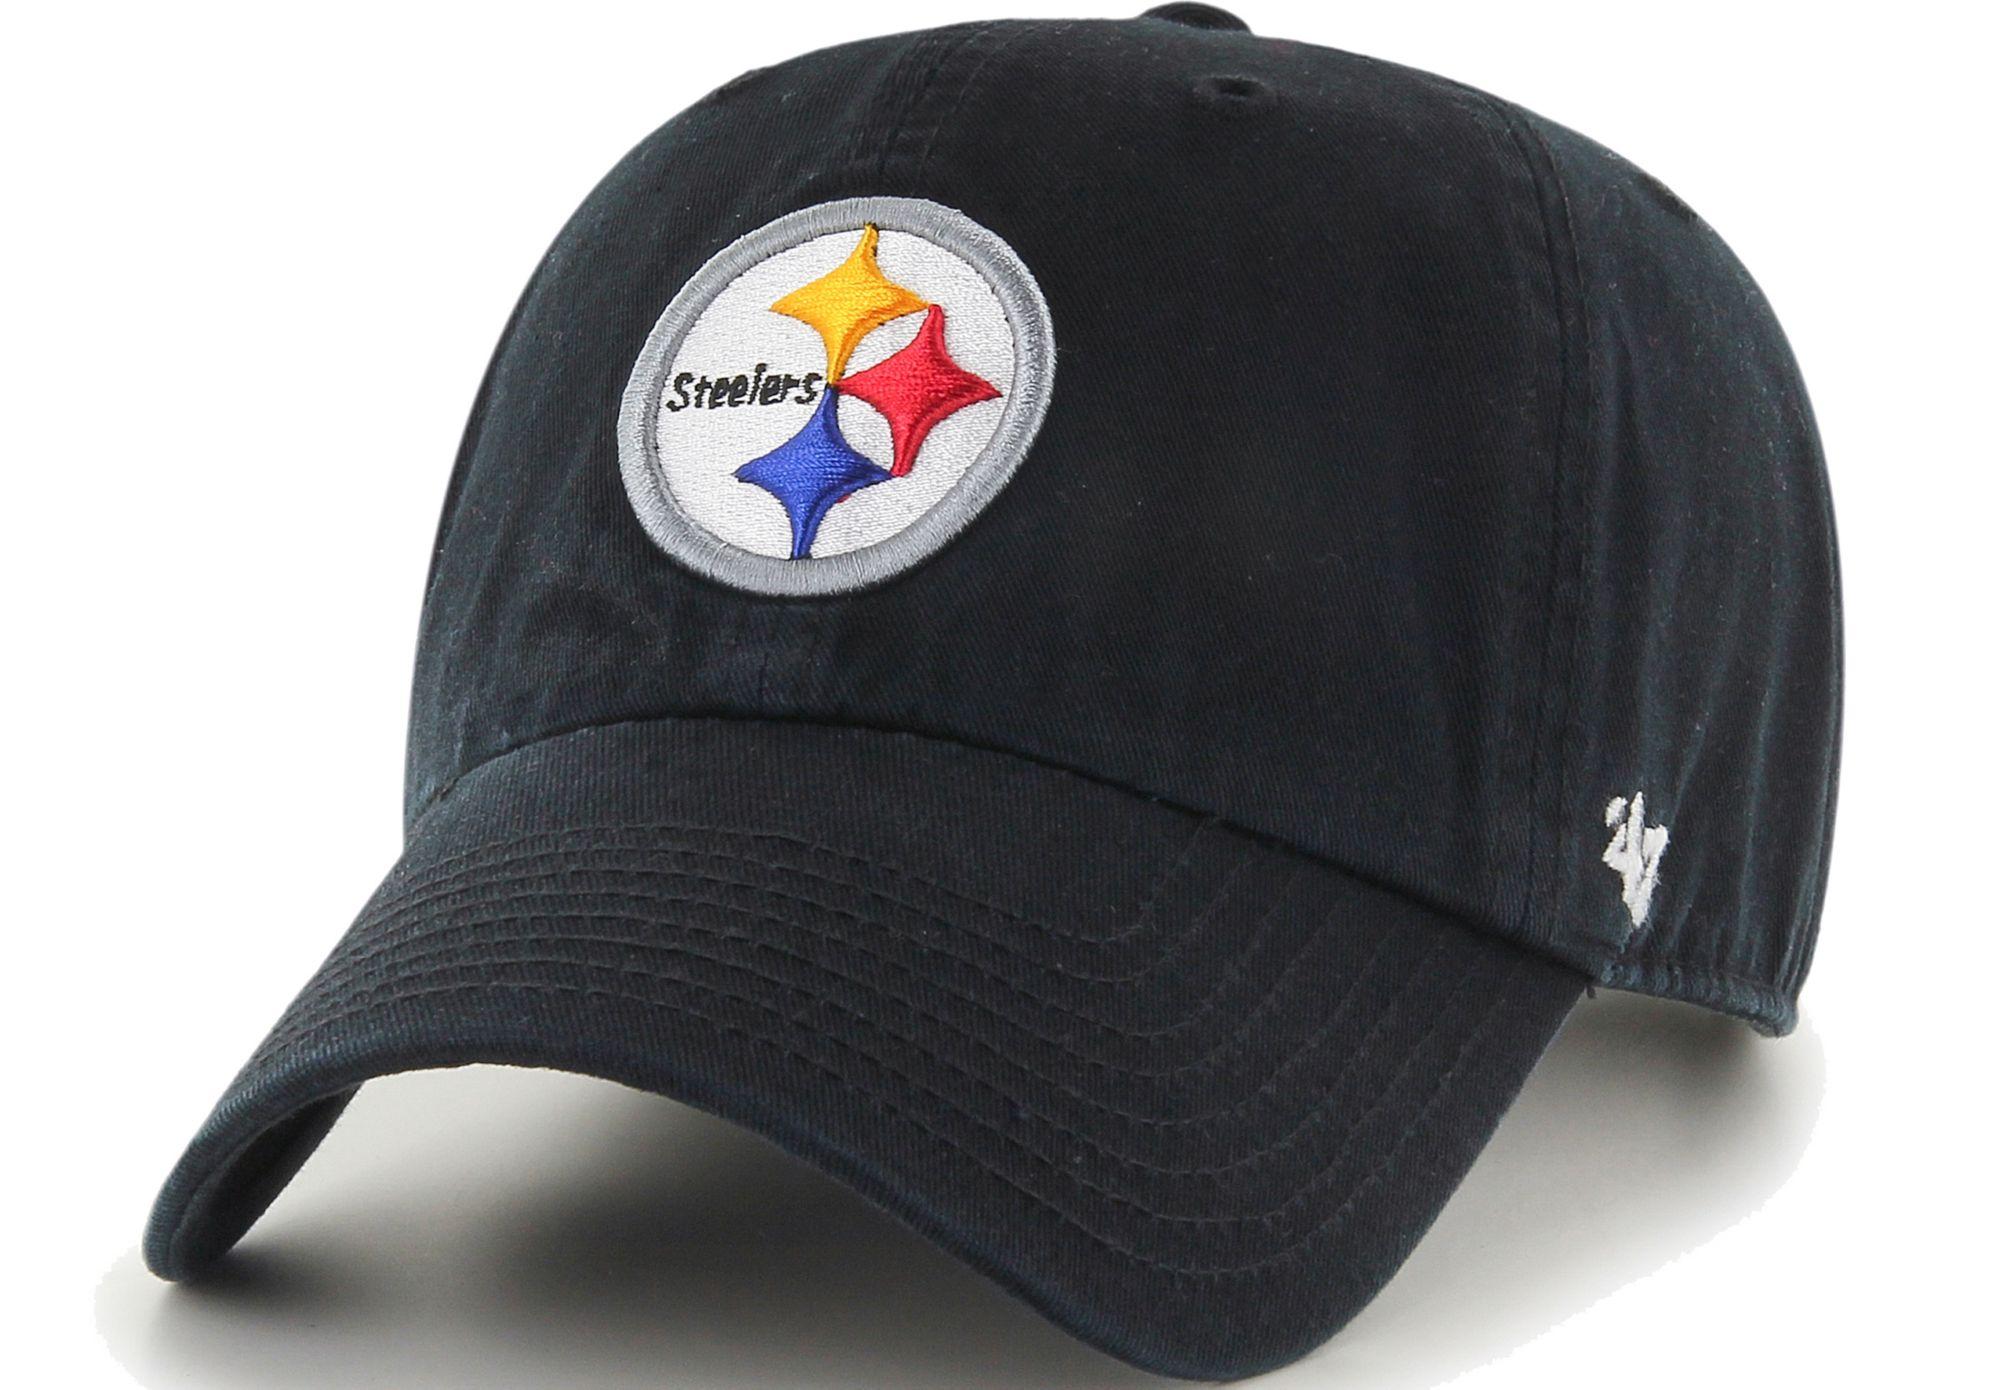 pittsburgh steelers hats